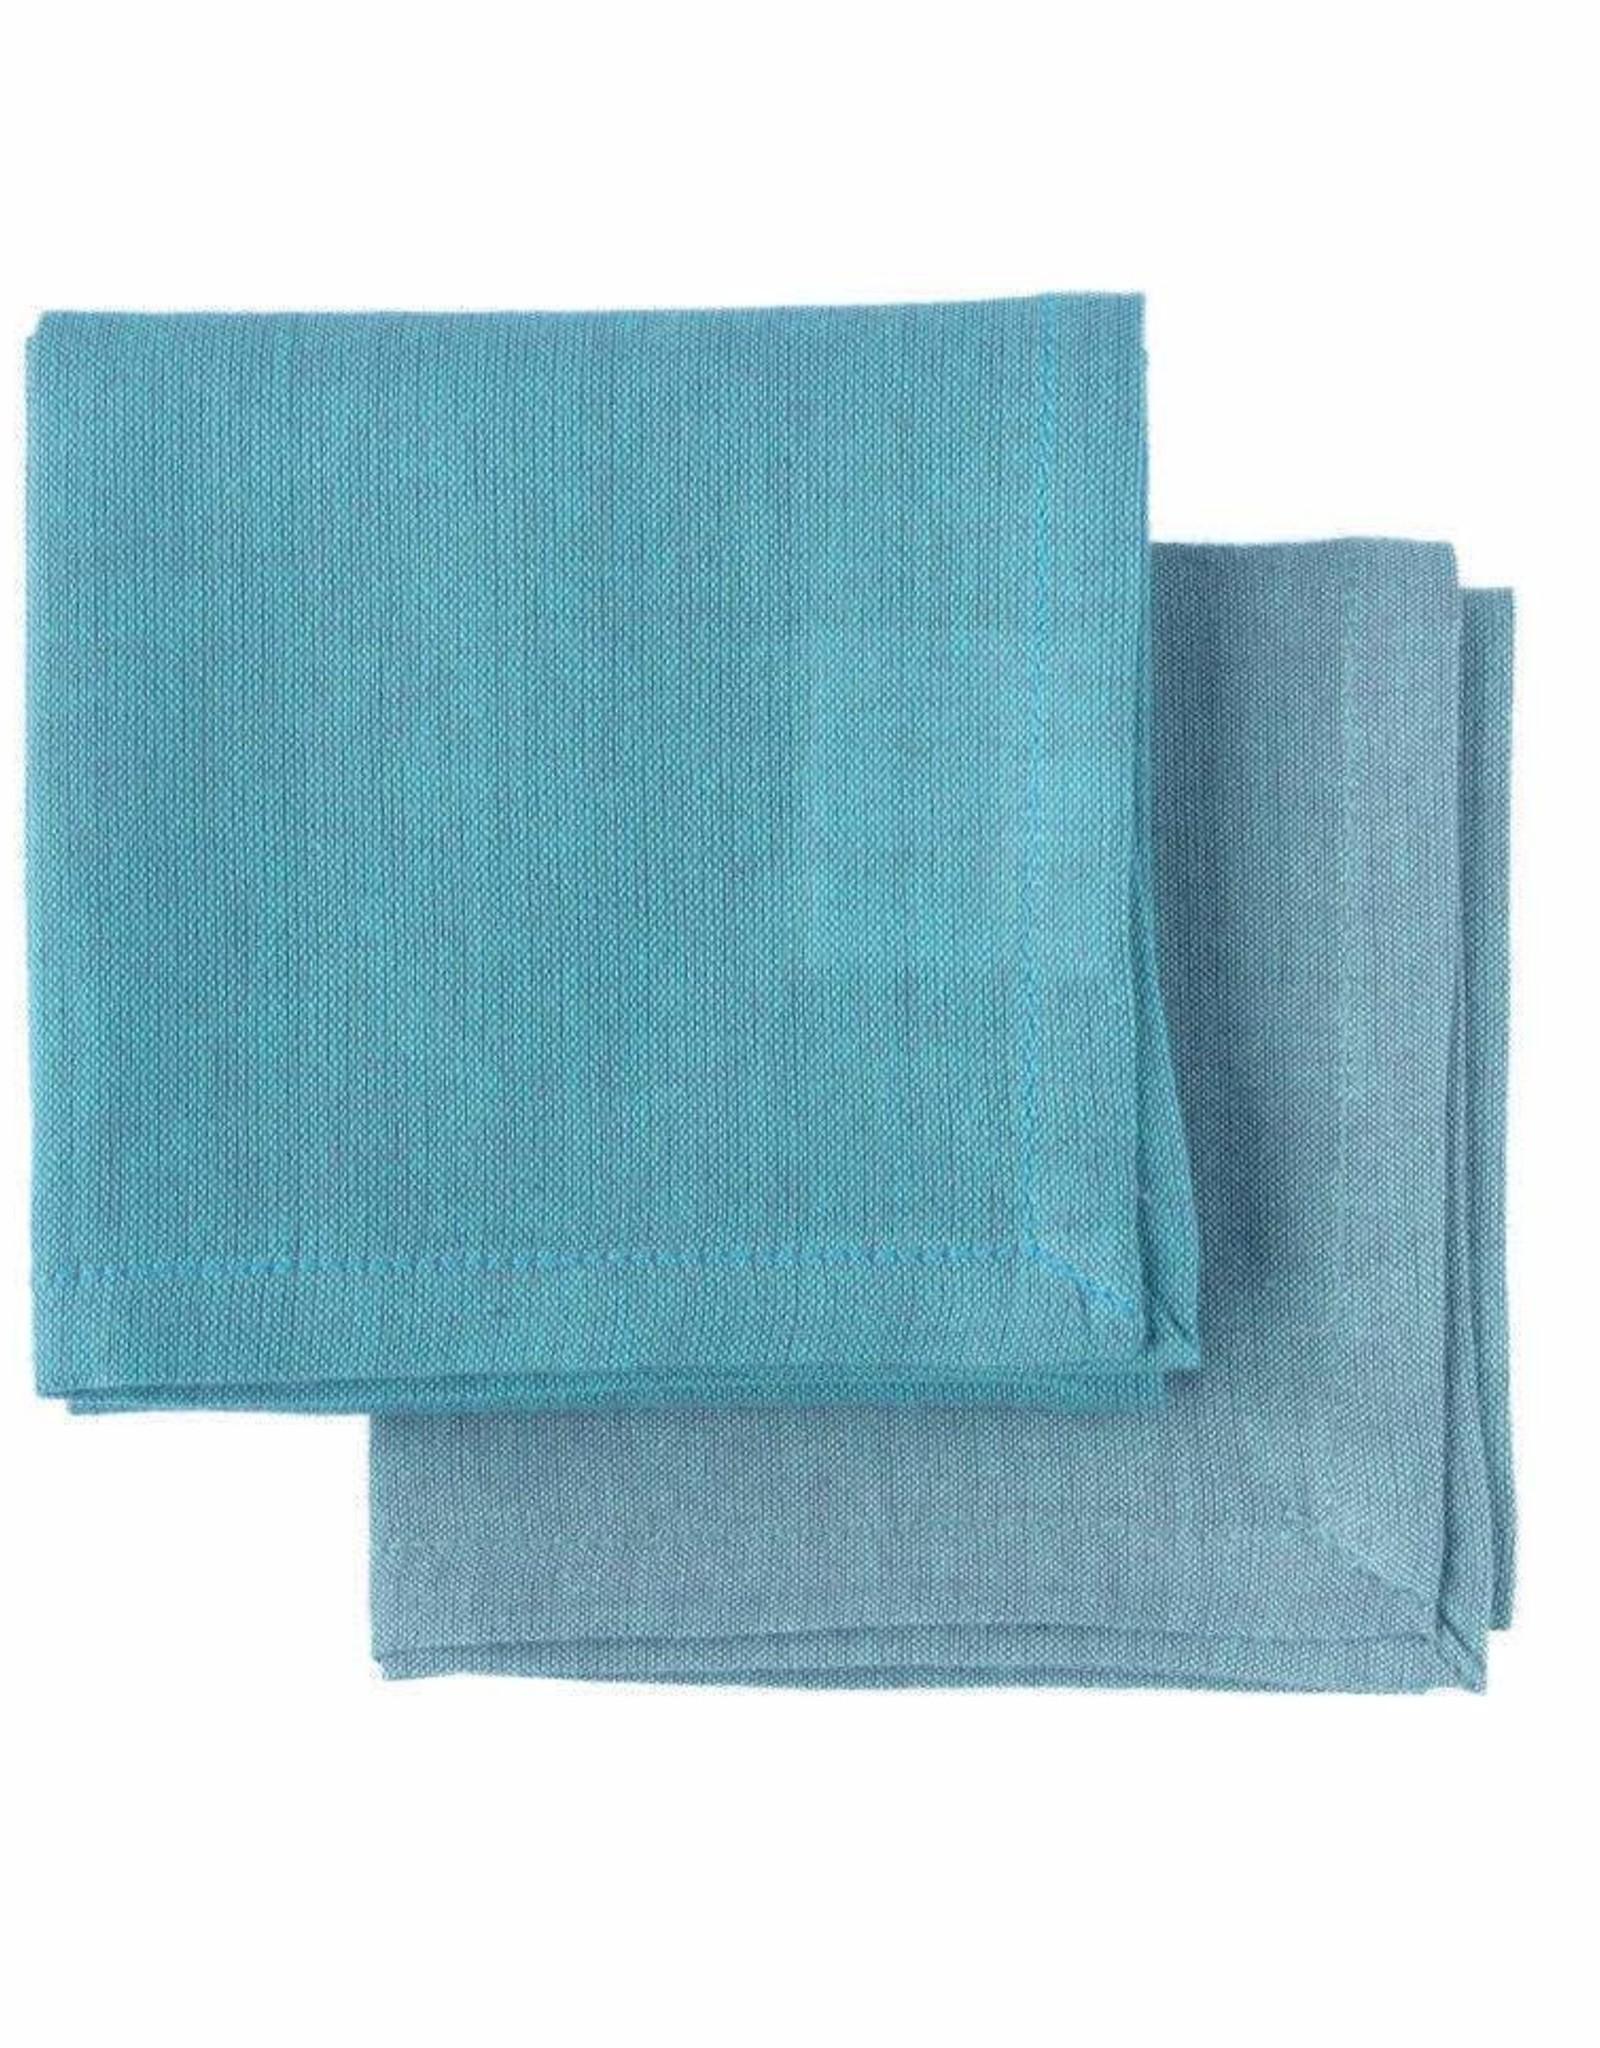 India, 16 x 16 Cotton Handkerchief Vienna